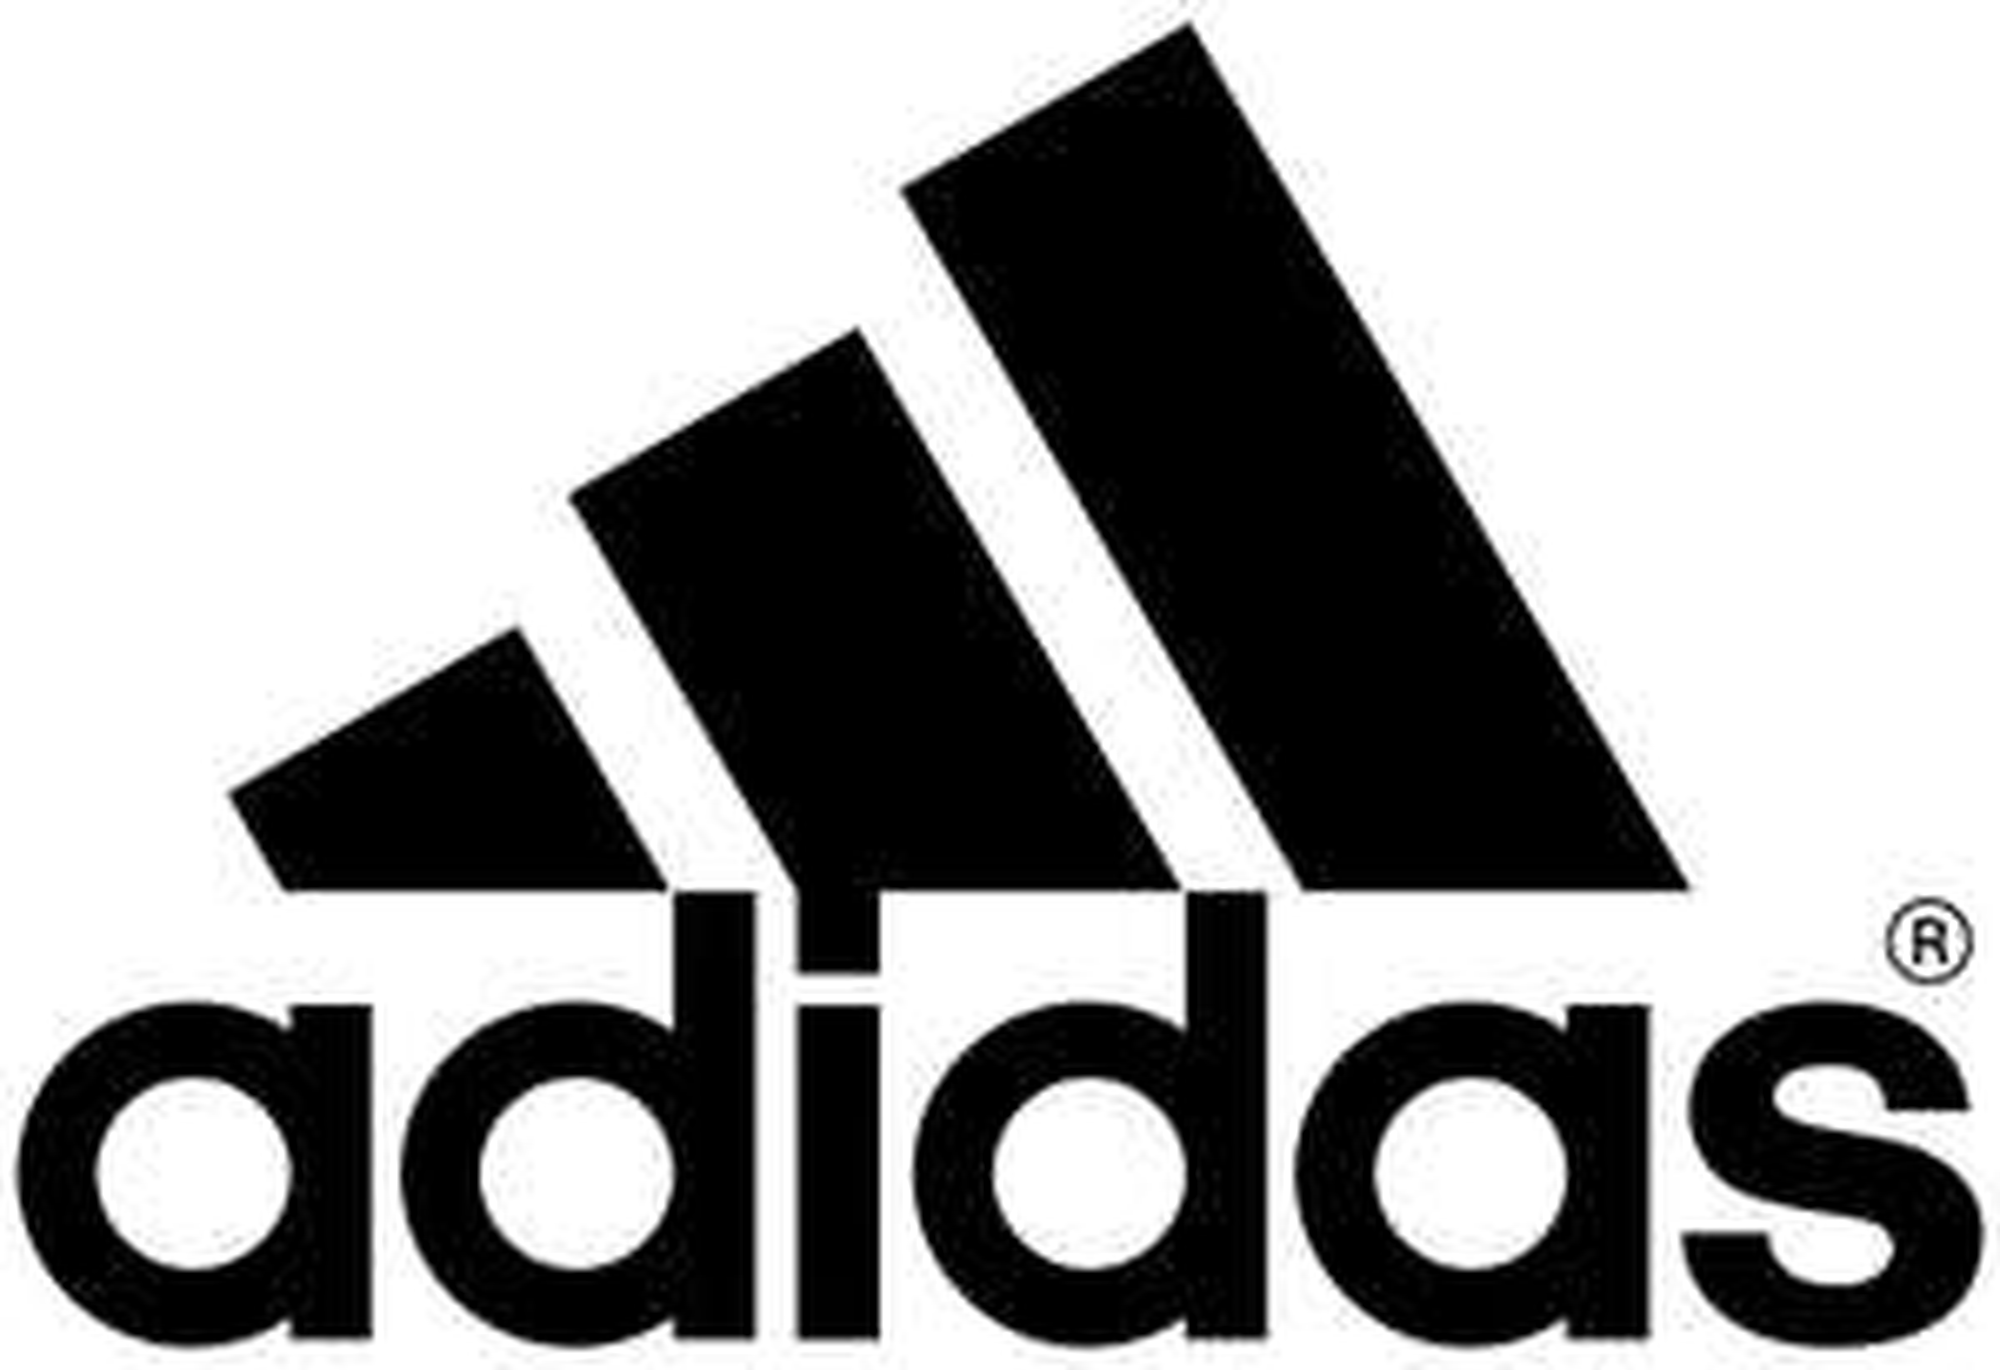 Nur heute 25% extra Rabatt auf adidas Originals Produkte